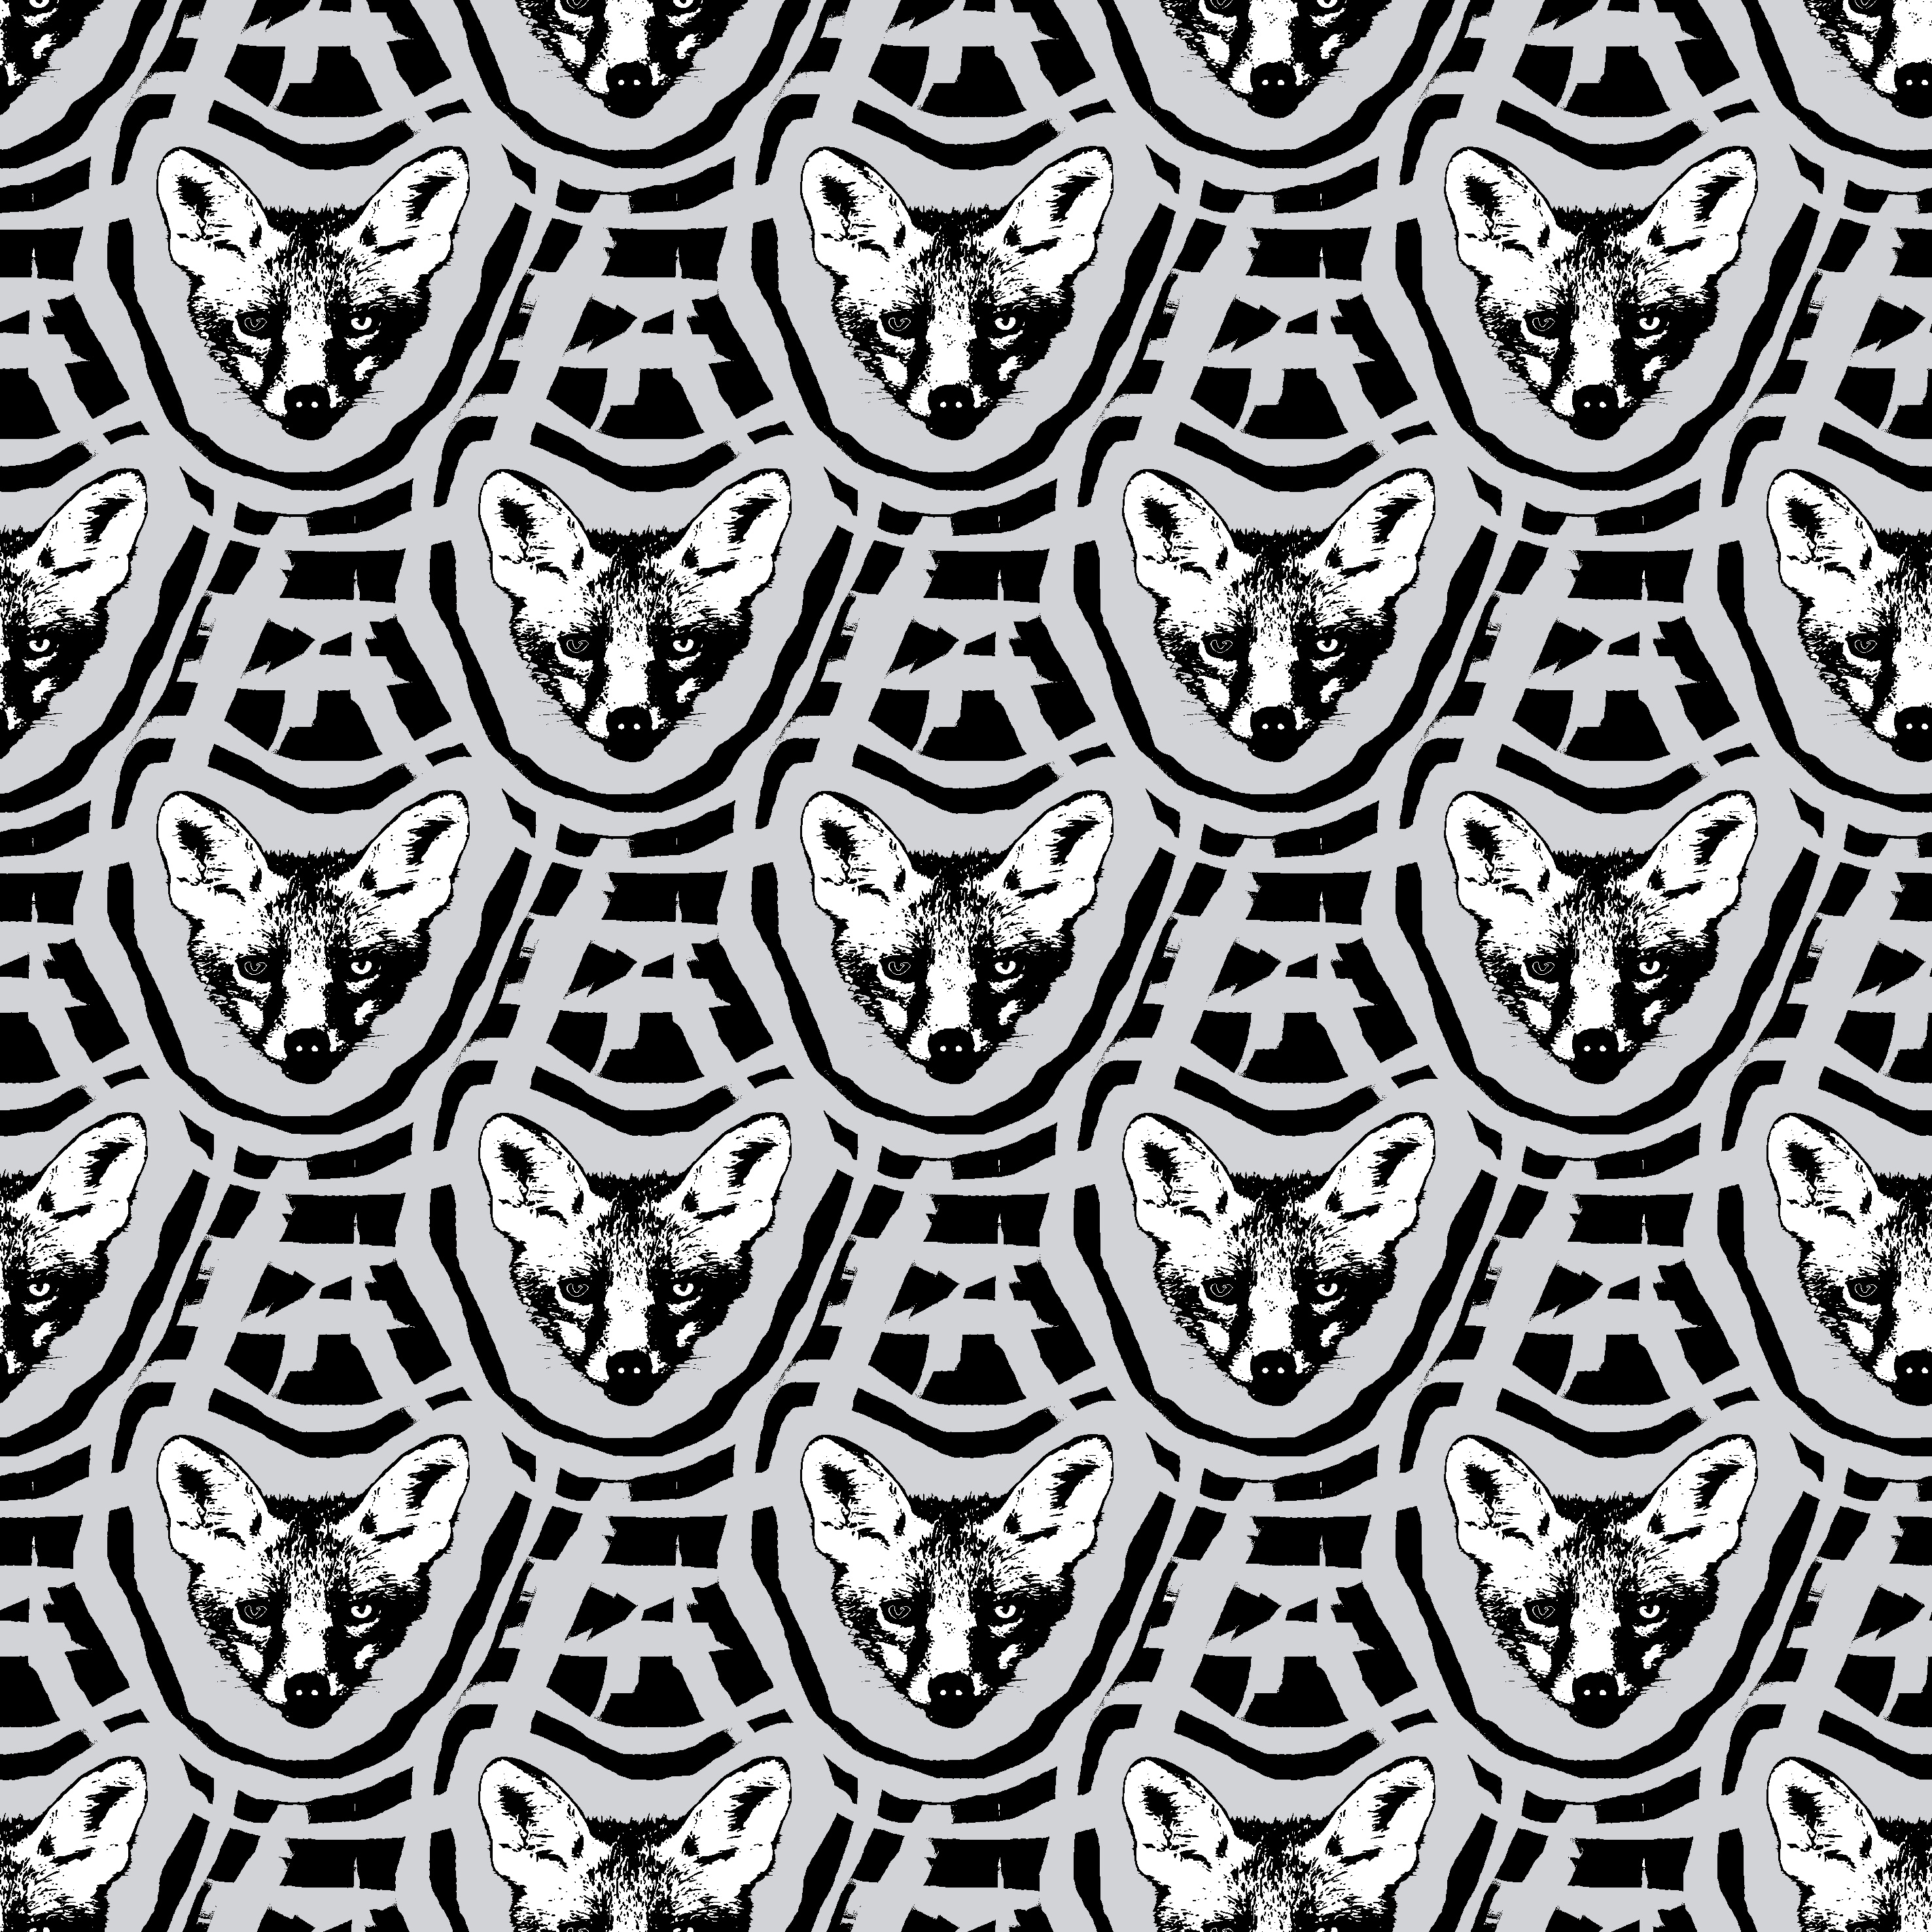 foxFaceseamlessblkgrey125x25.jpg